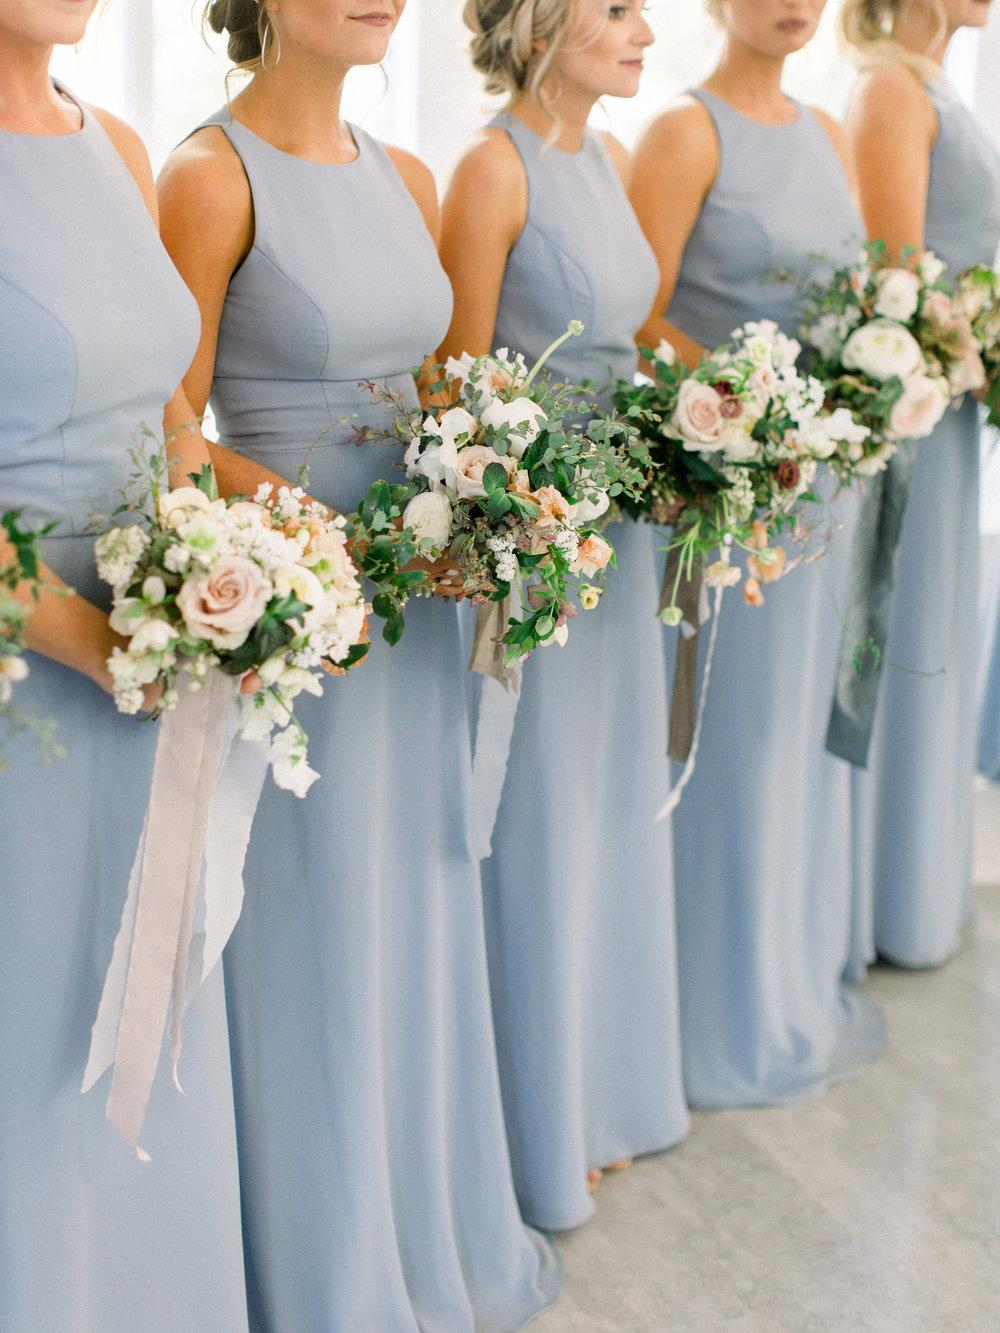 jessica-zimmerman-bridesmaid-bouquets-blue-silk-ribbon.jpg